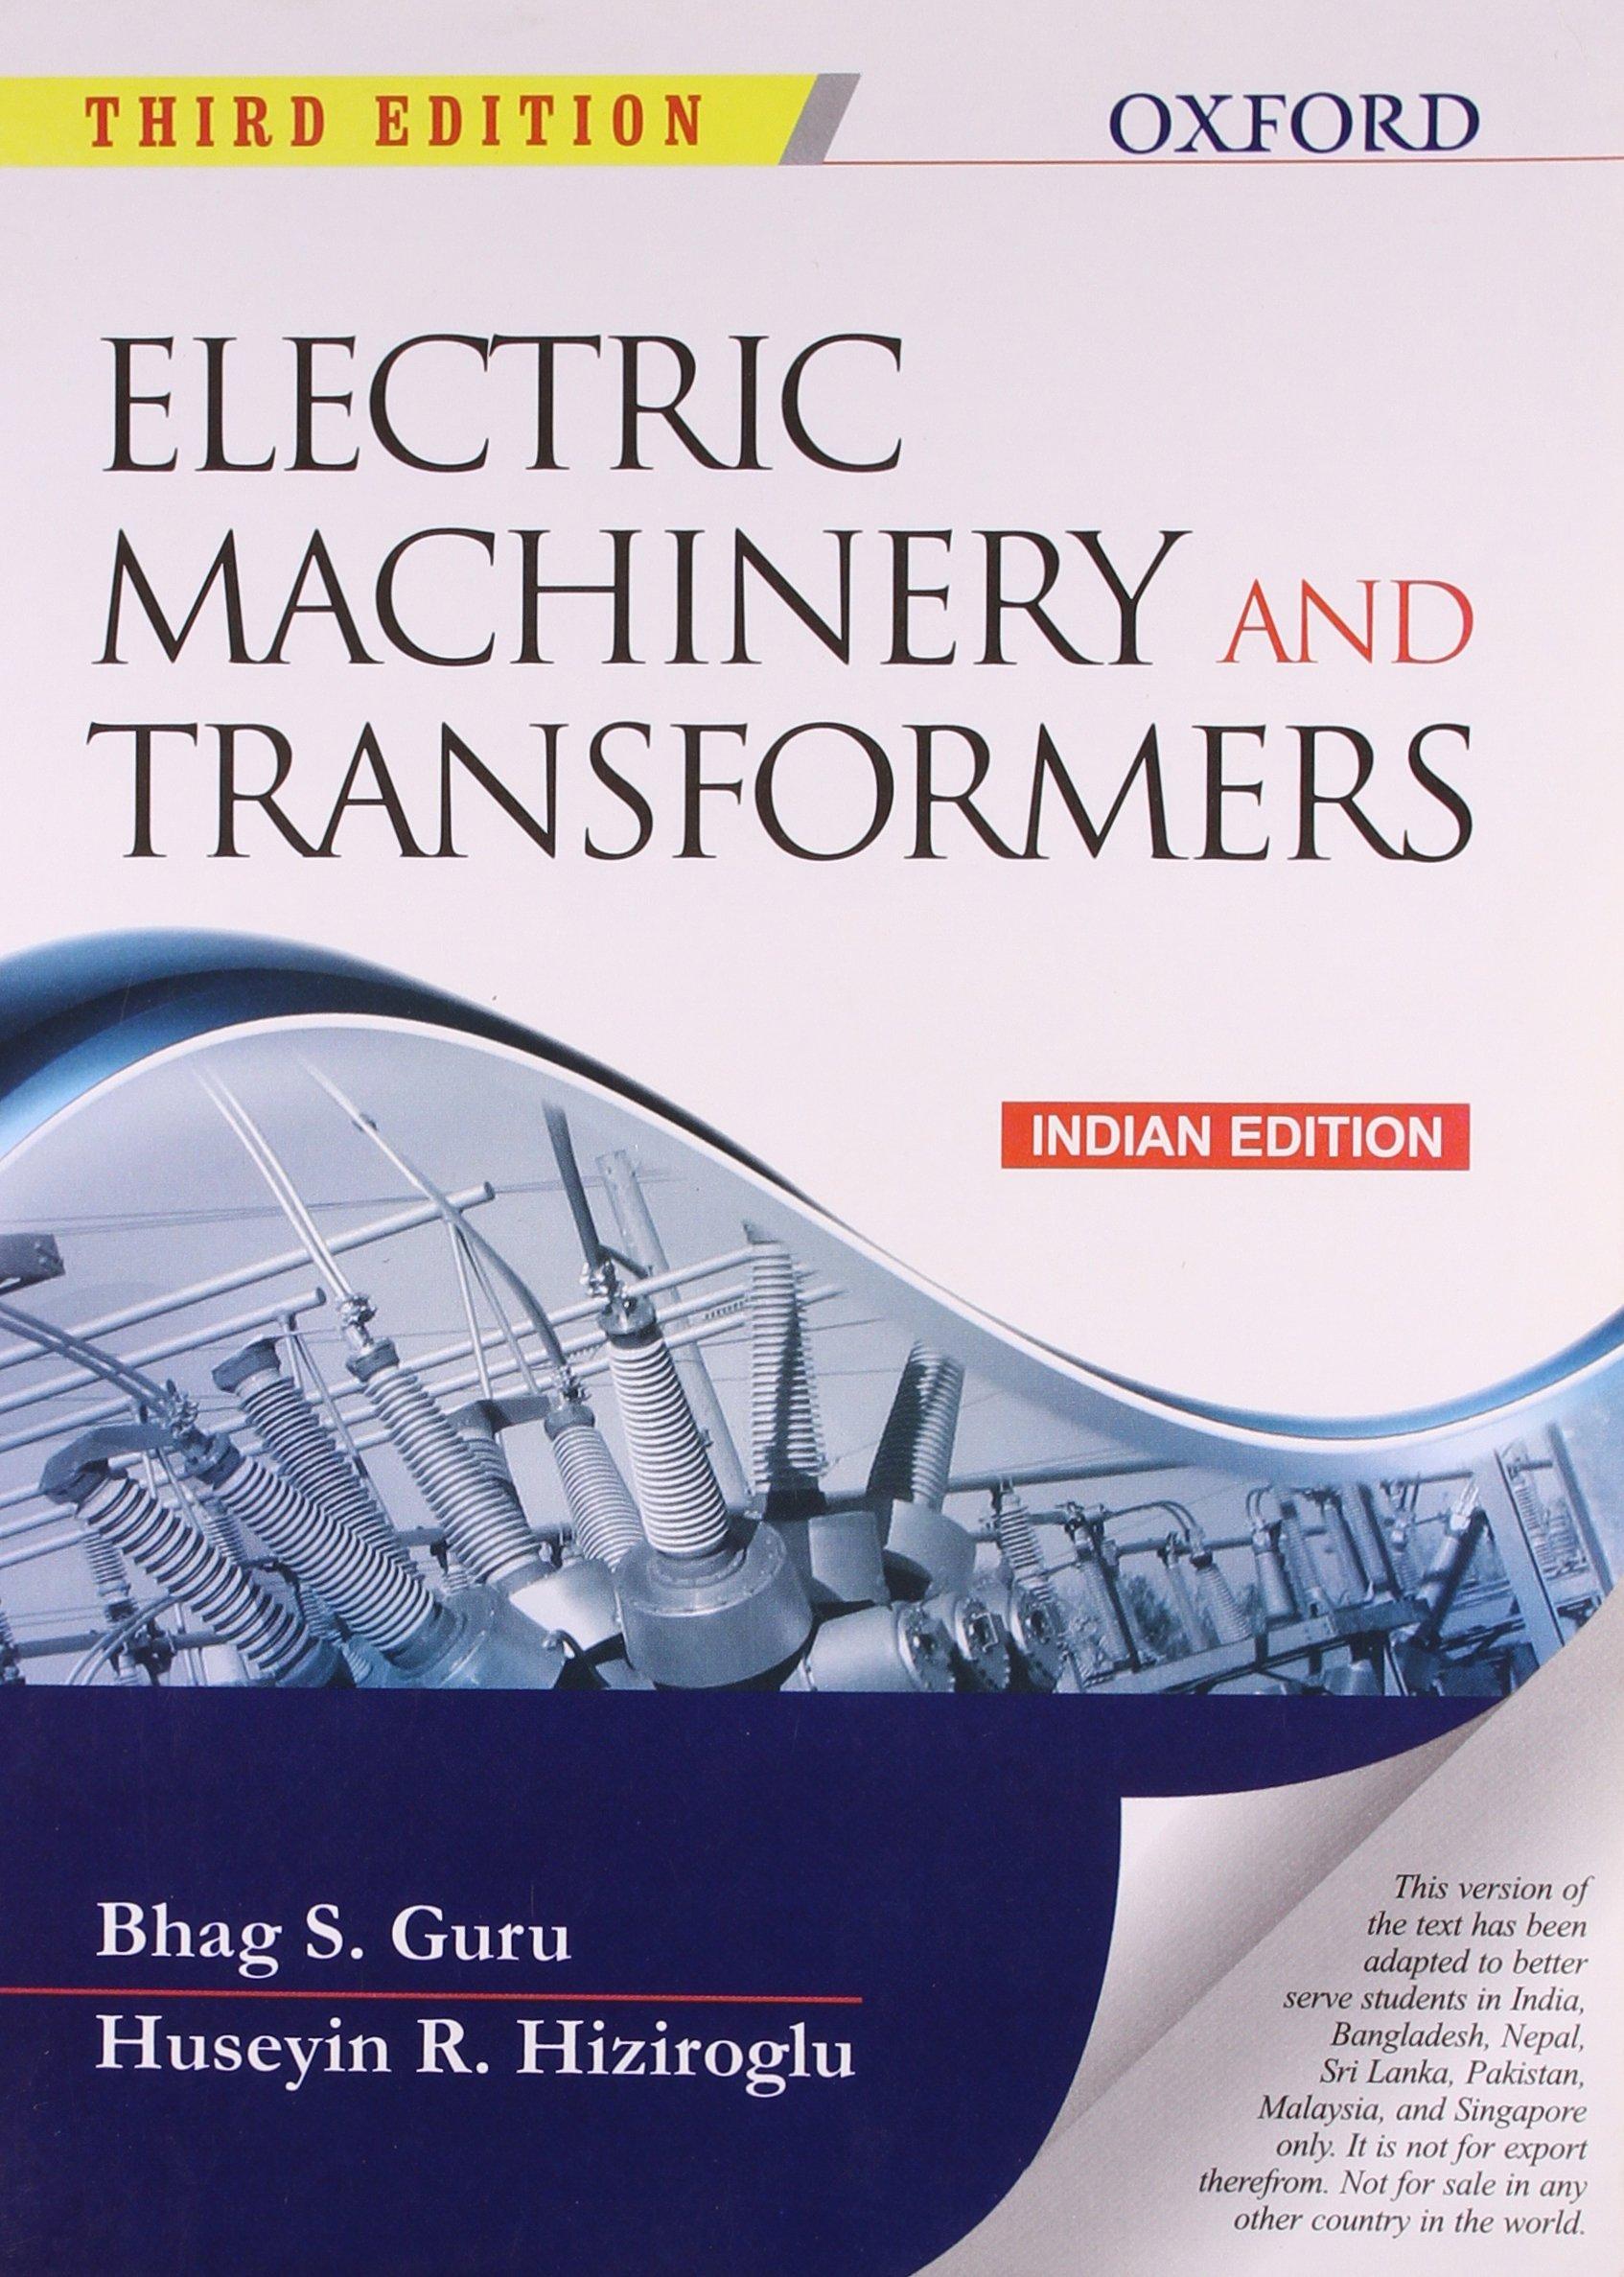 Electric Machinery and Transformers: Bhag S Guru: 9780198089827:  Amazon.com: Books